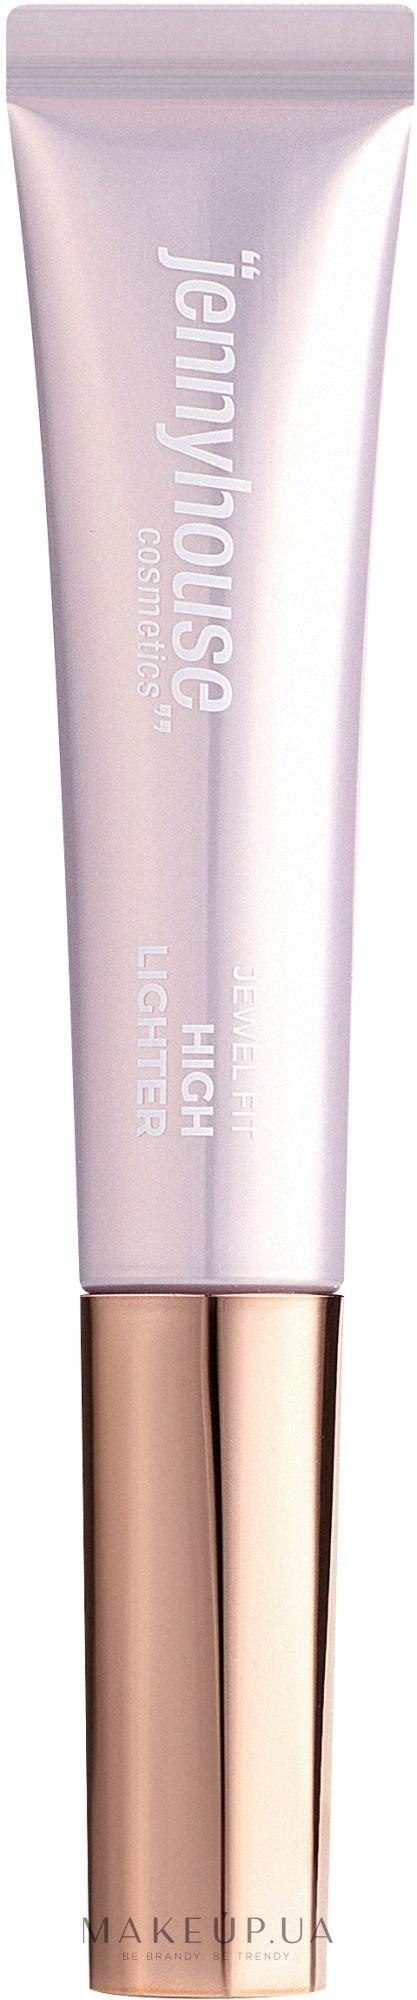 High Lighter Glow Shine Jennyhouse Корея — фото №1